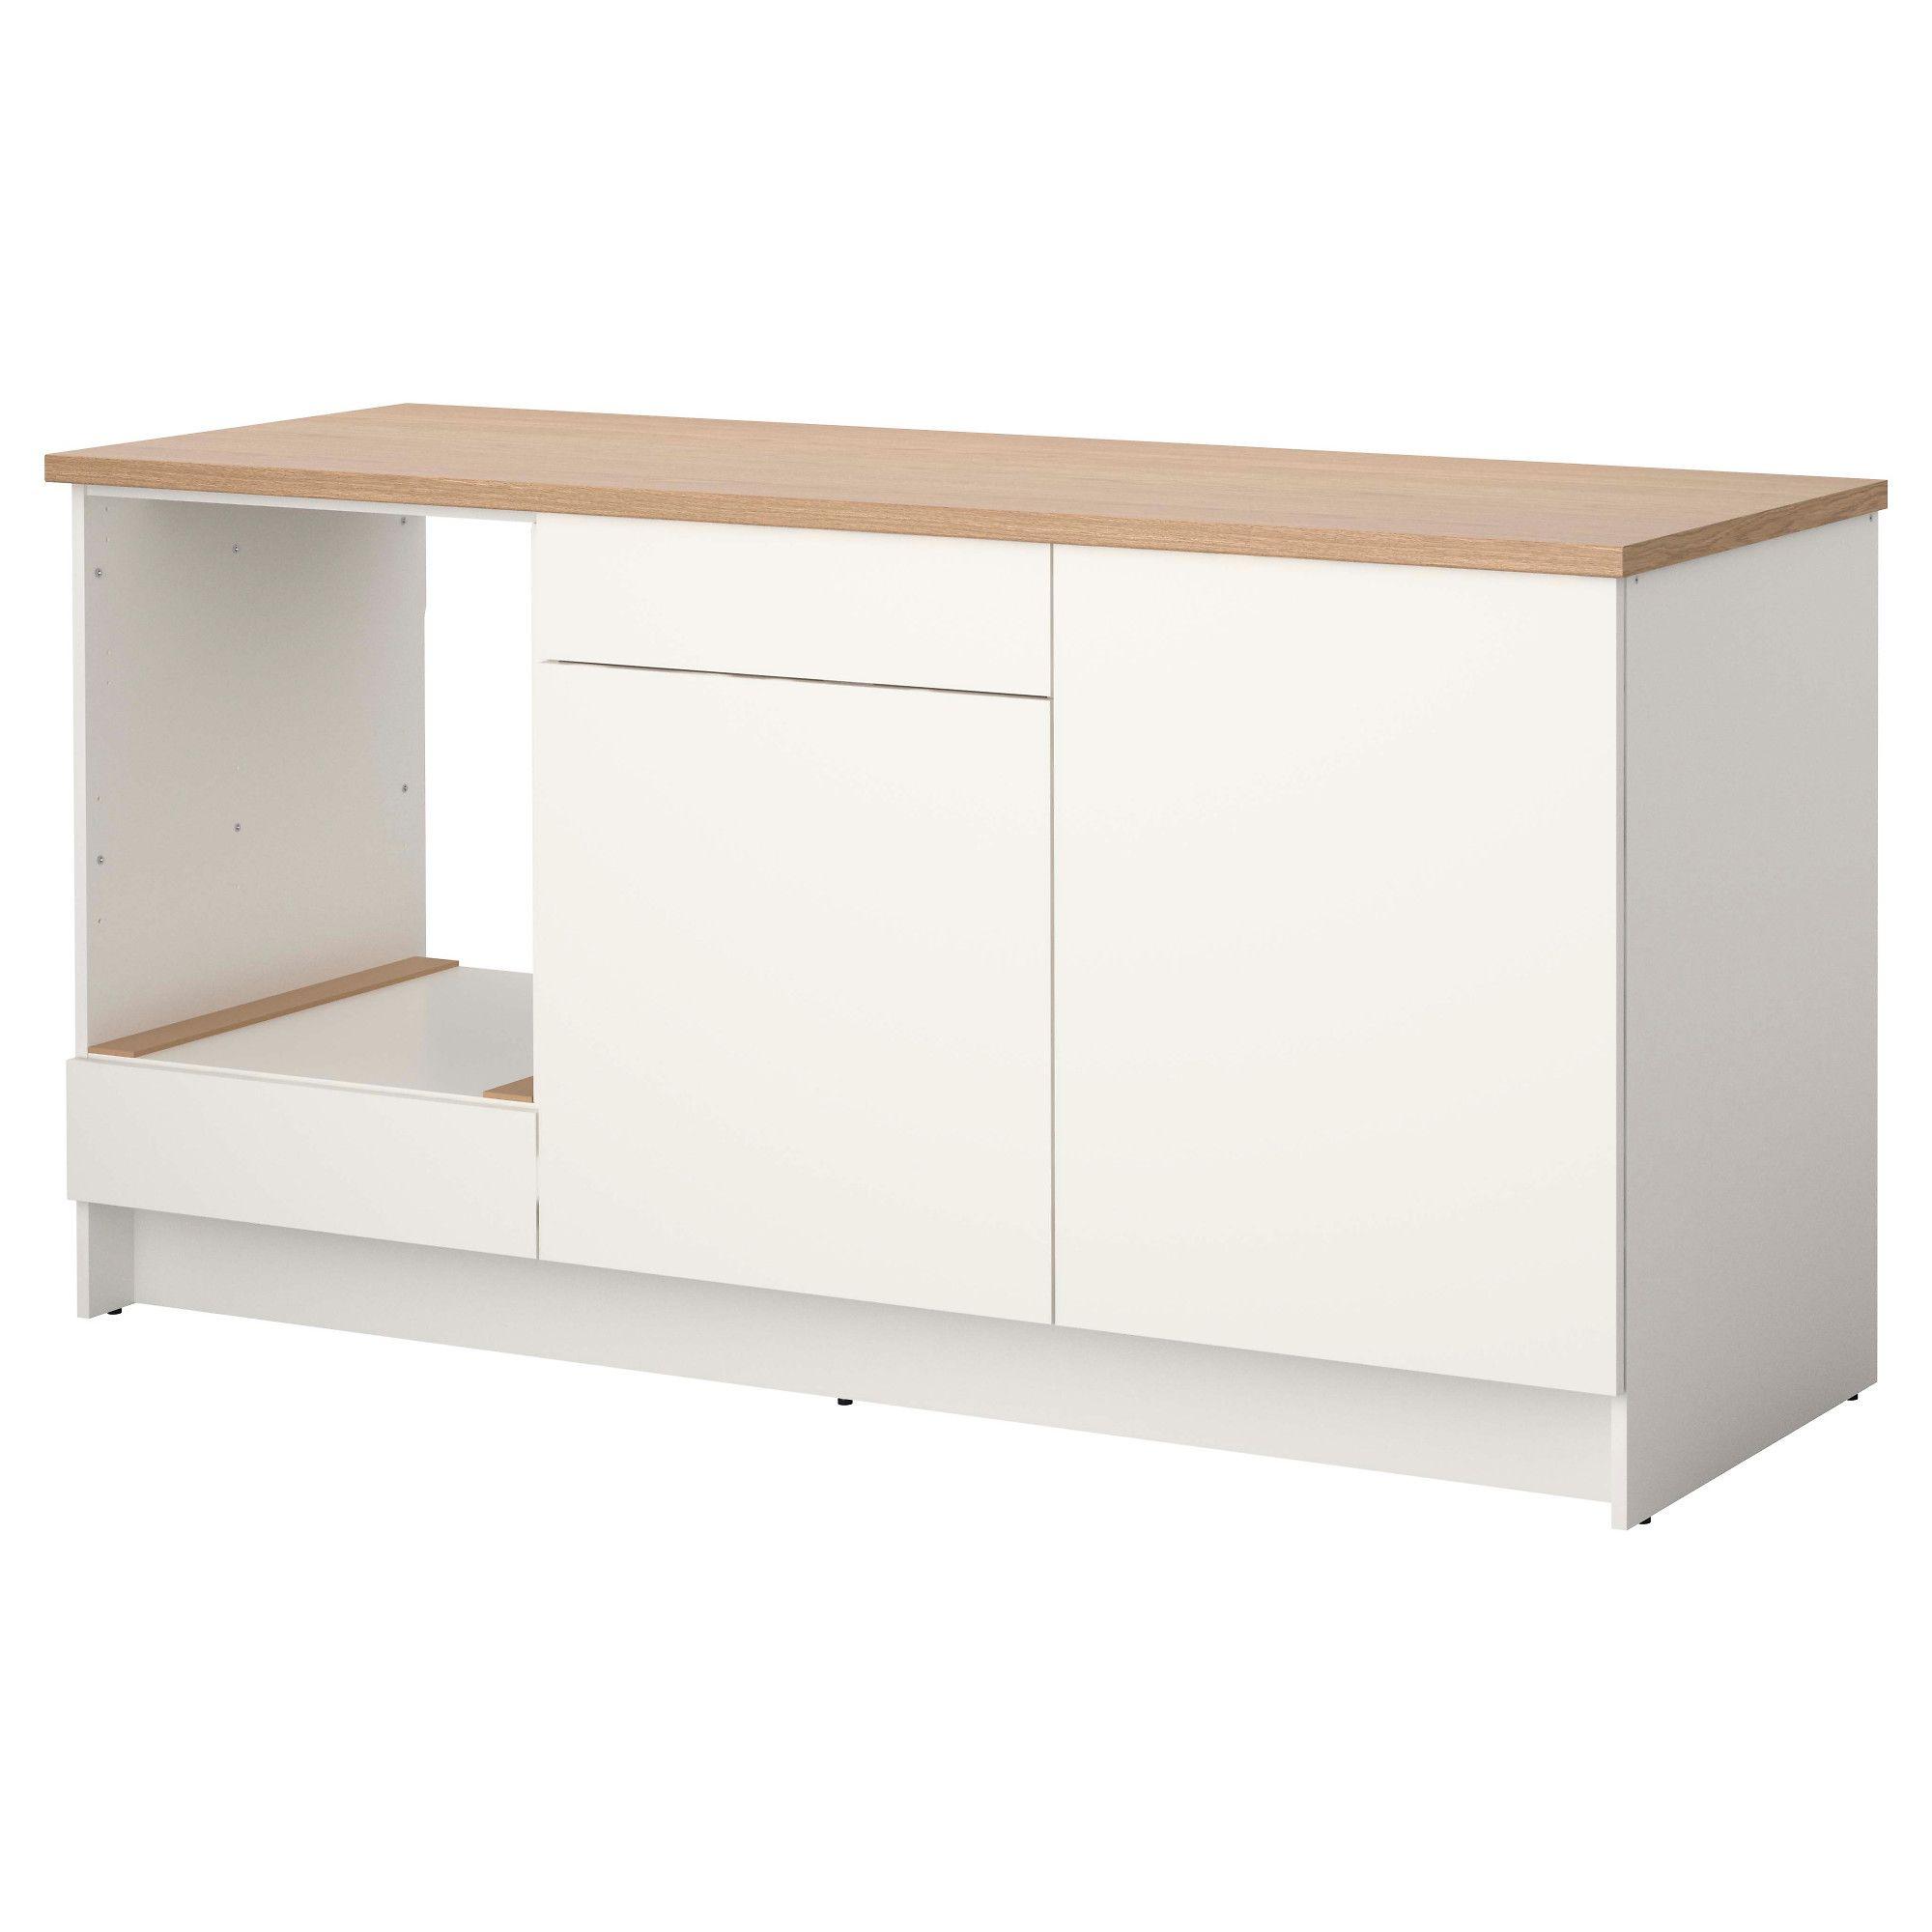 Knoxhult Element Bas Avec Portes Et Tiroir Blanc Ikea Ikea Porte Armoire Tiroir